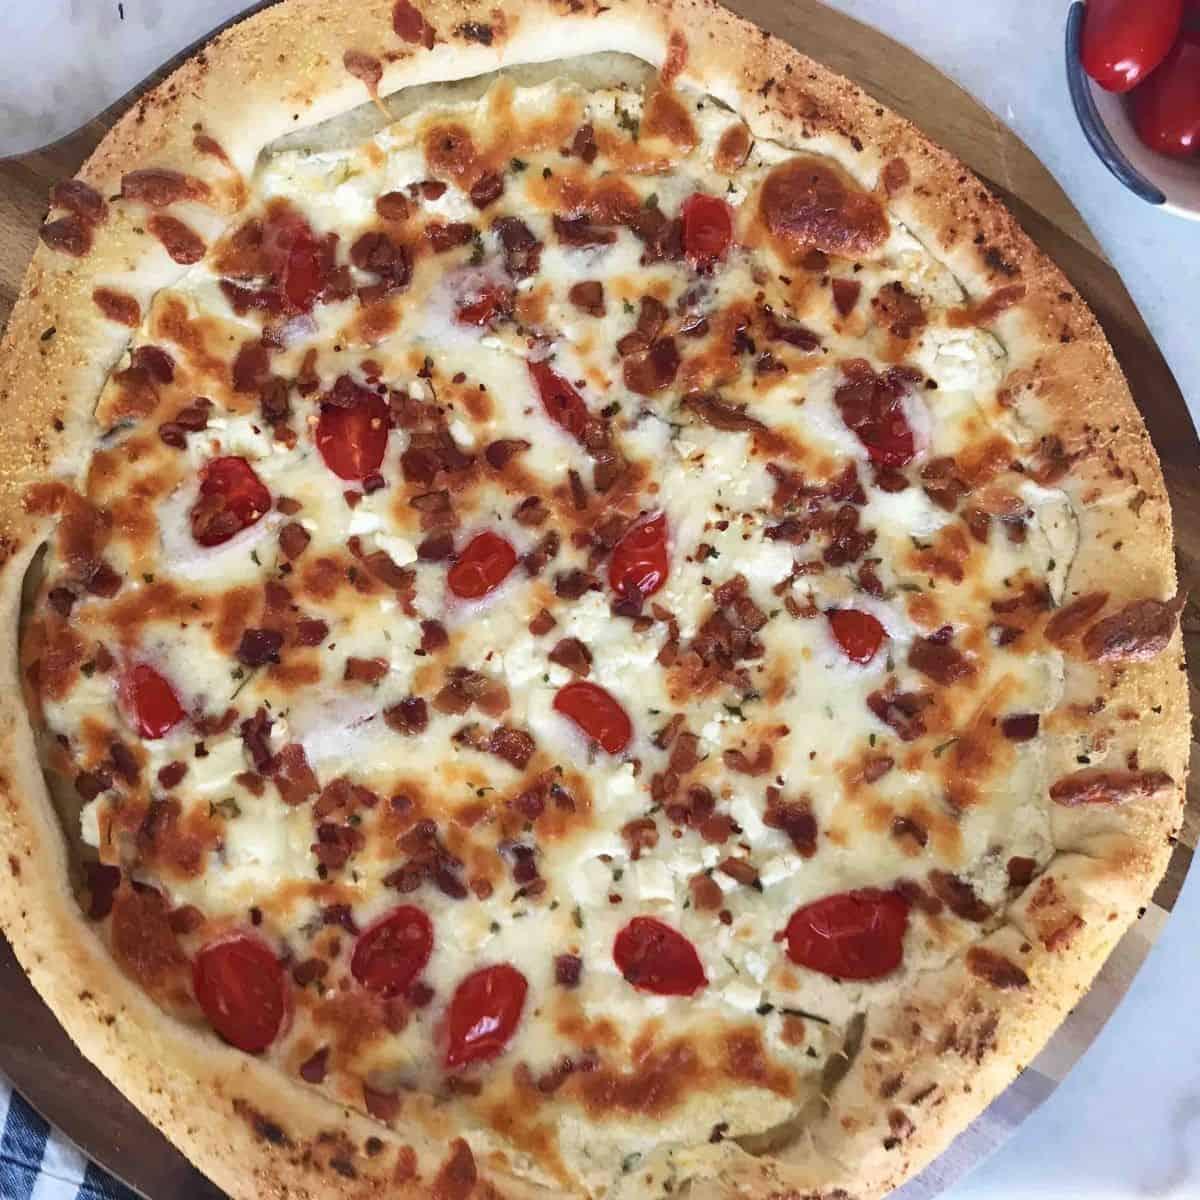 full pizza on wooden board.